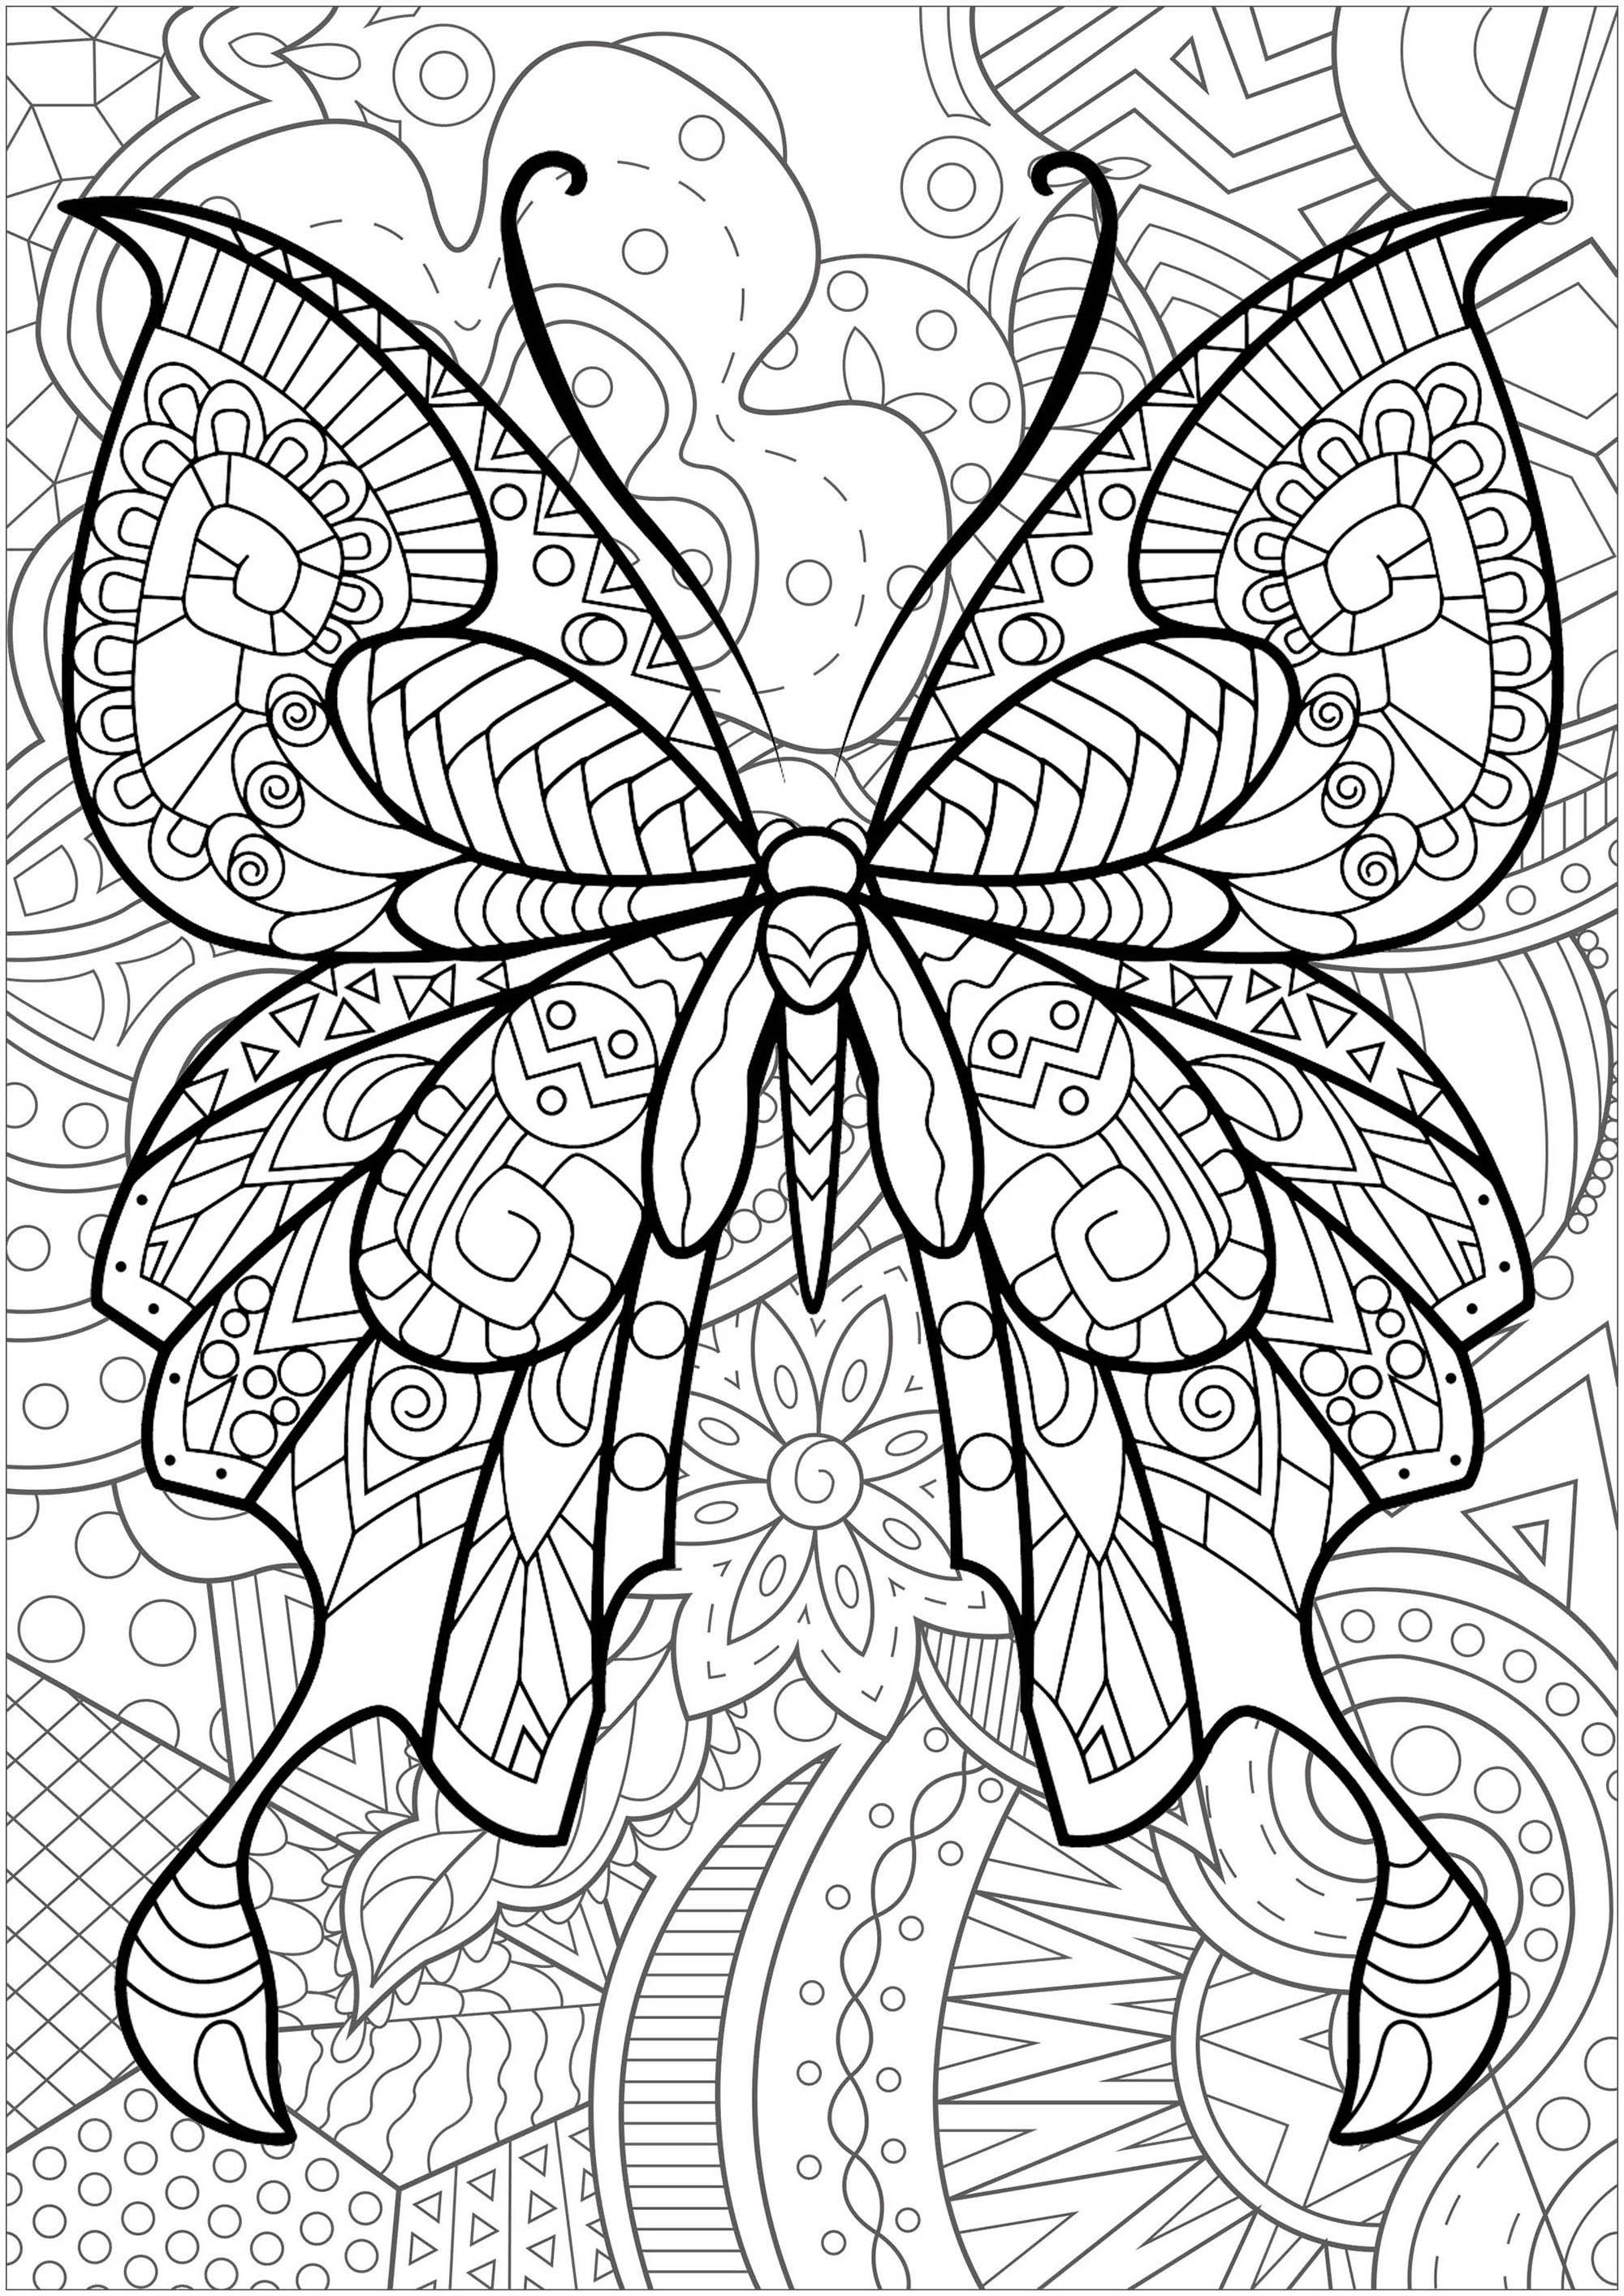 Mariposas E Insectos 56109 Mariposas E Insectos Colorear